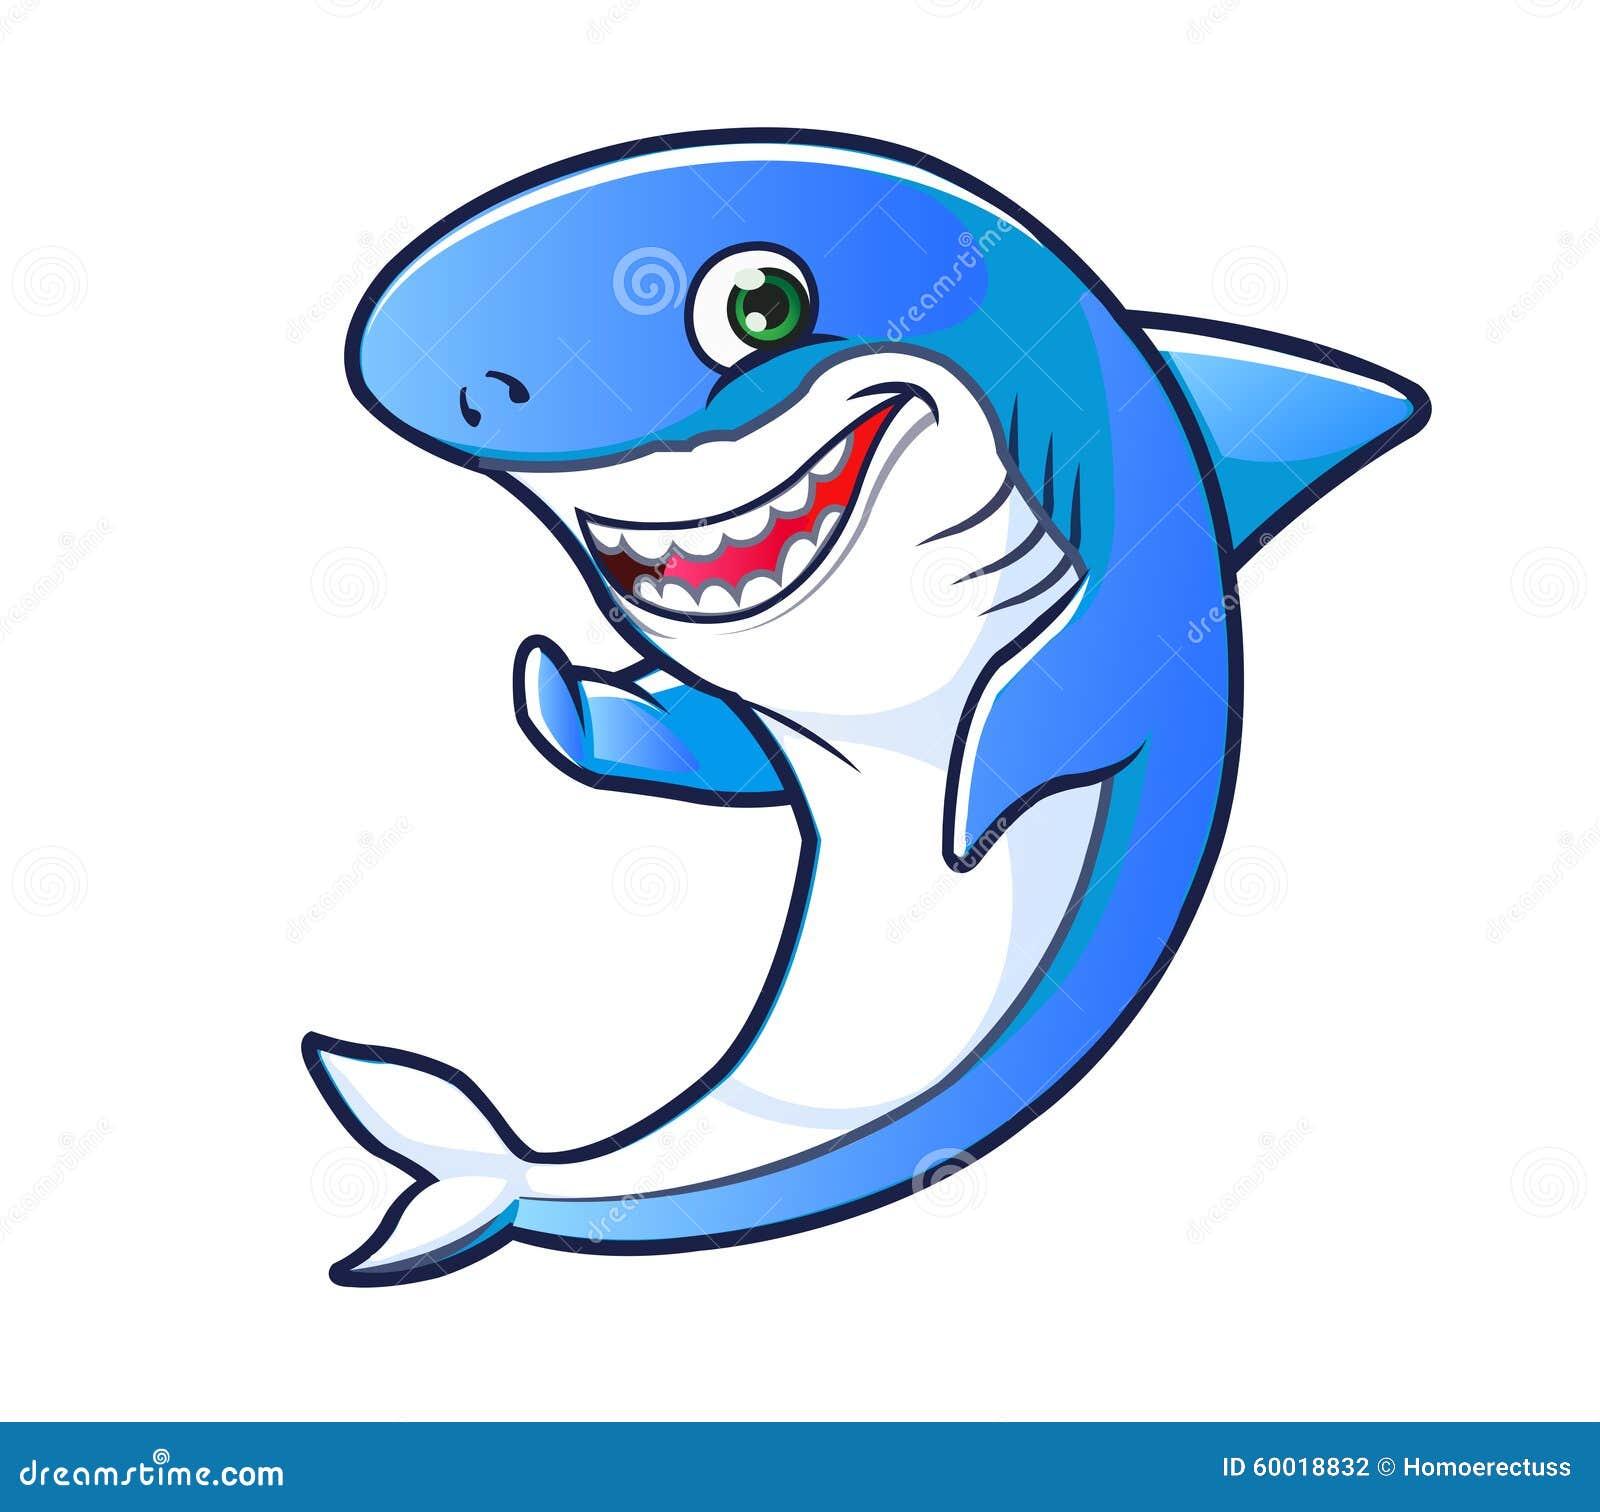 Vector Illustration of Funny and Friendly Shark Cartoon Mascot.